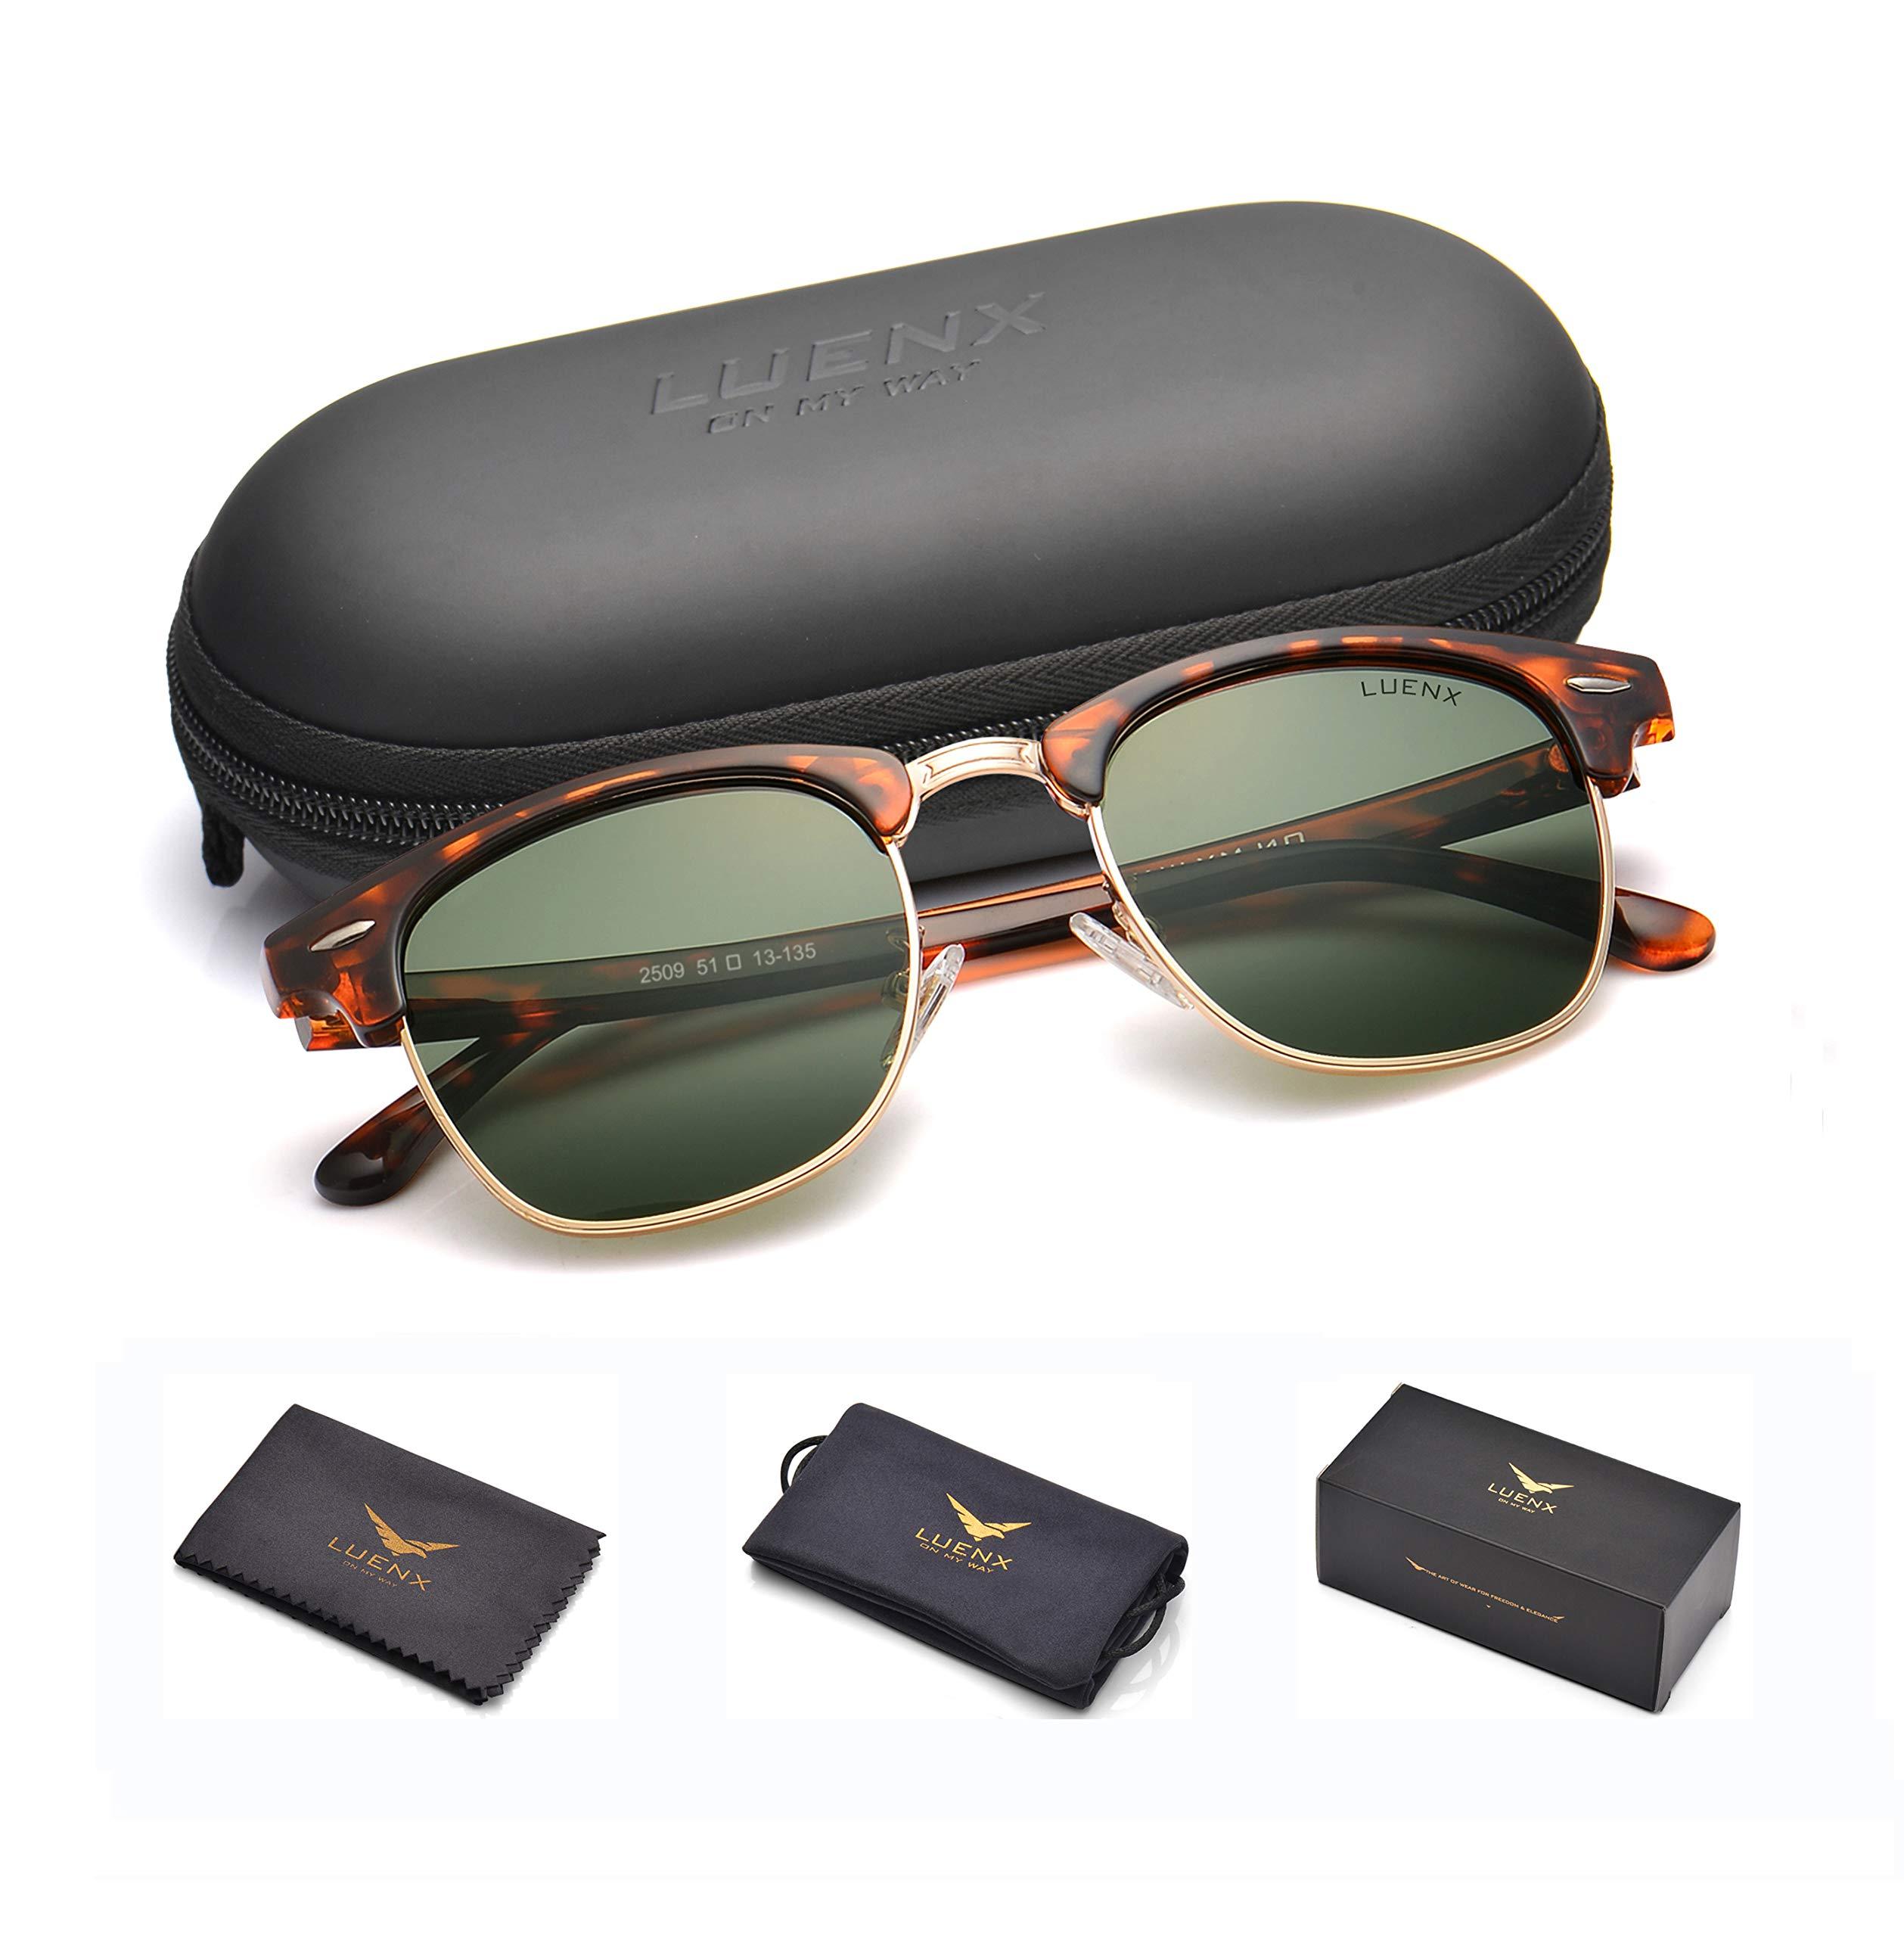 LUENX Men Semi Rimless Polarized Sunglasses Women Grey Green Lens Tortoise Retro Frame 51MM,UV 400 with Case by LUENX